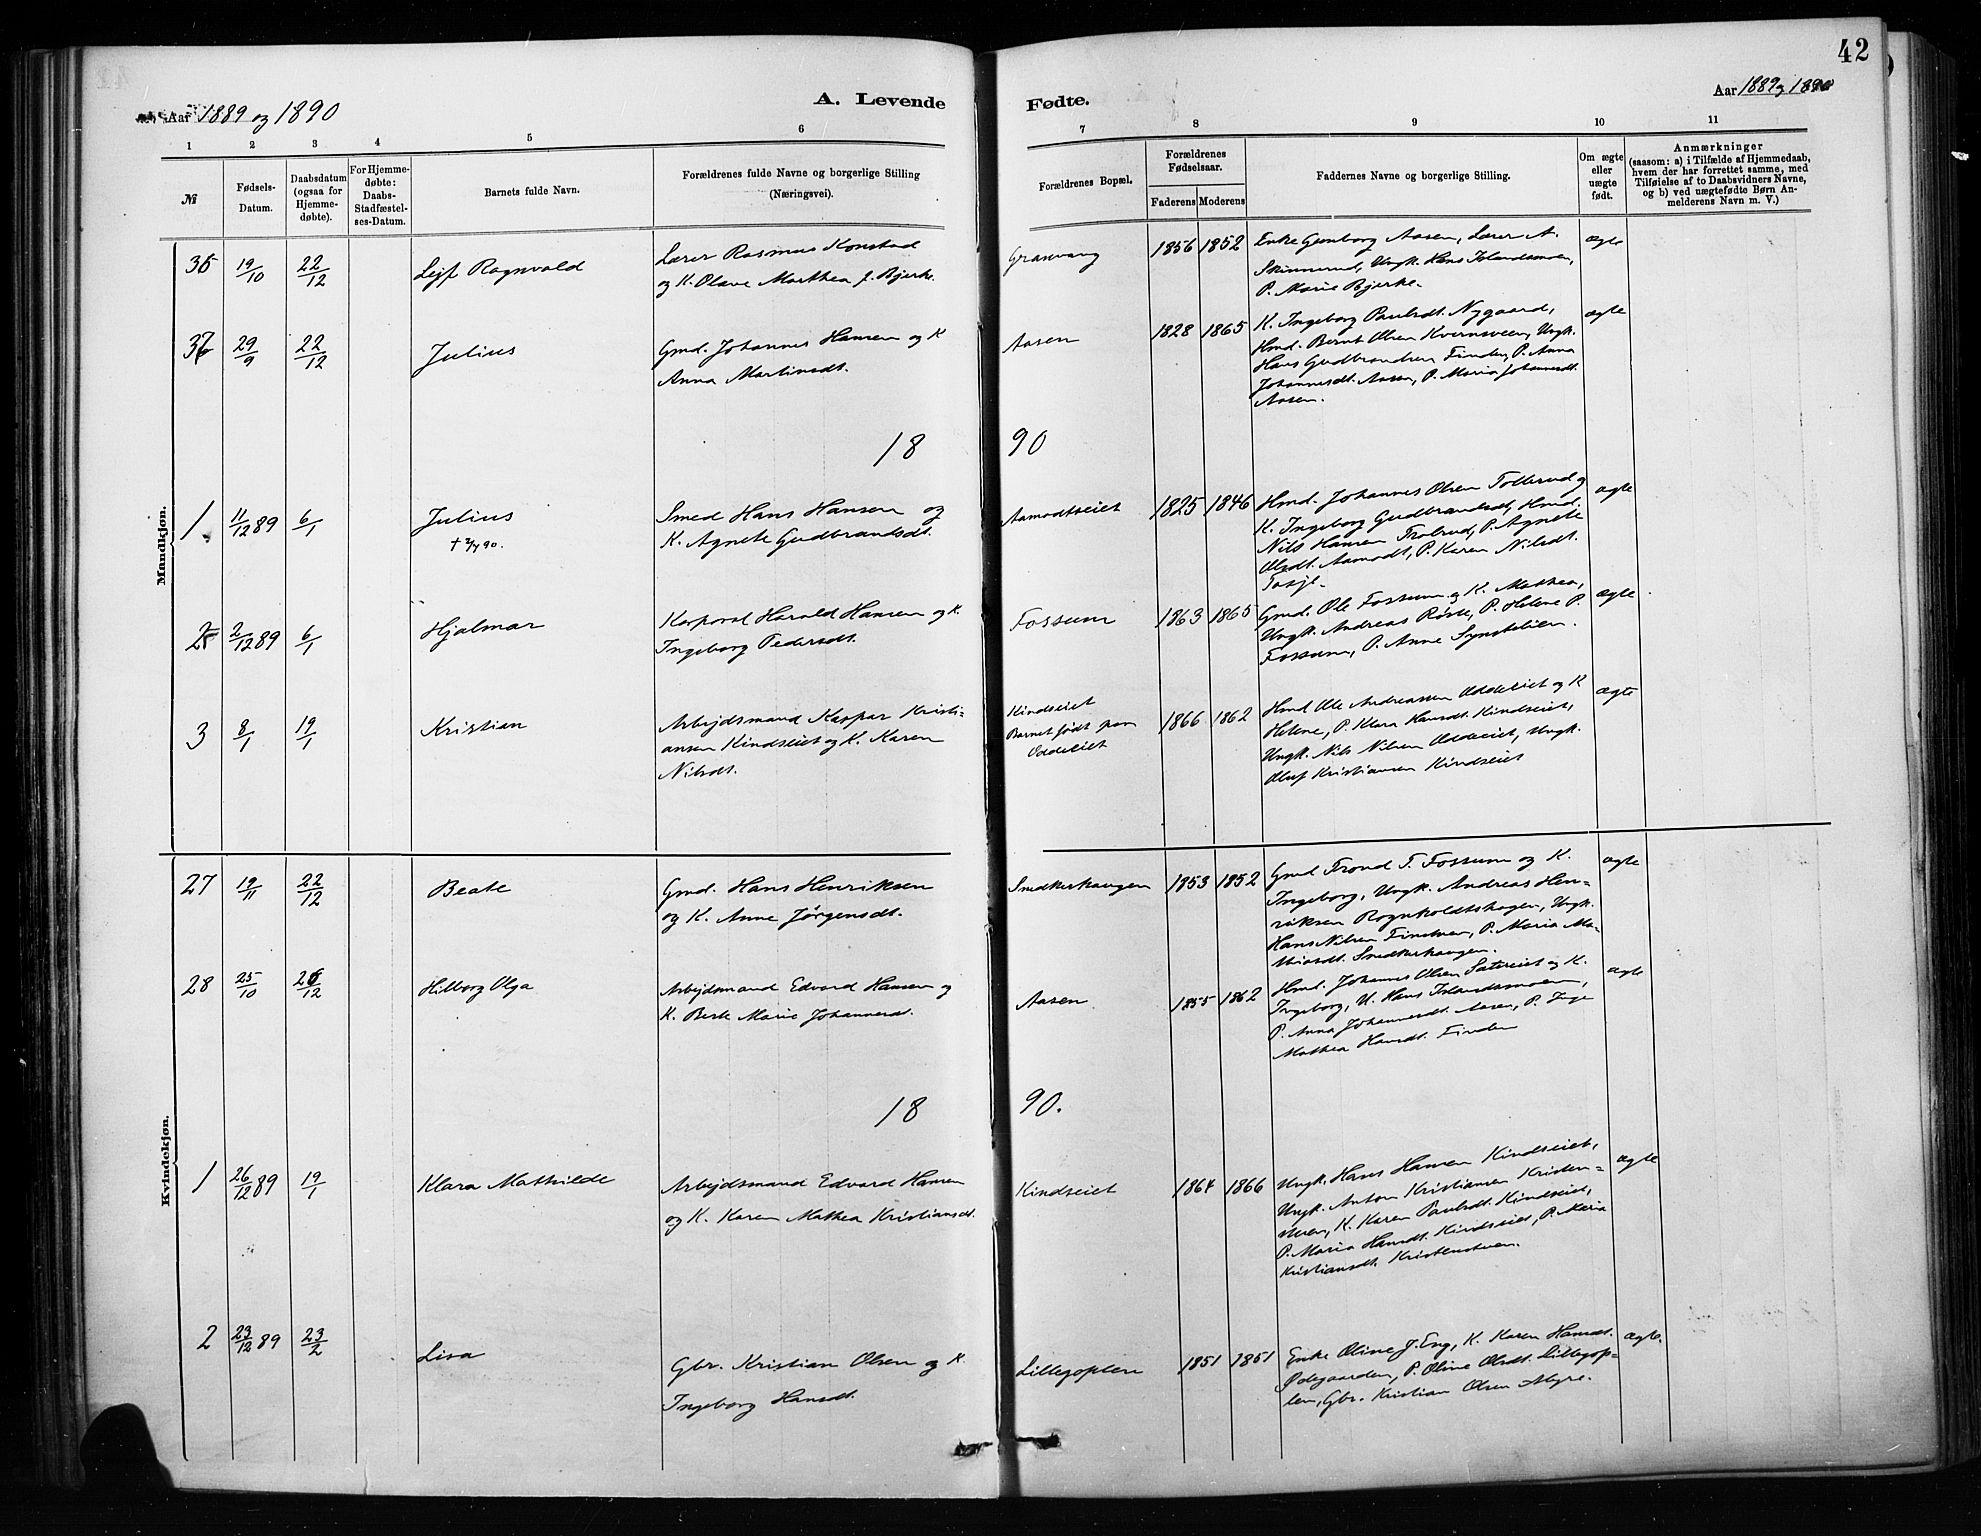 SAH, Nordre Land prestekontor, Ministerialbok nr. 4, 1882-1896, s. 42